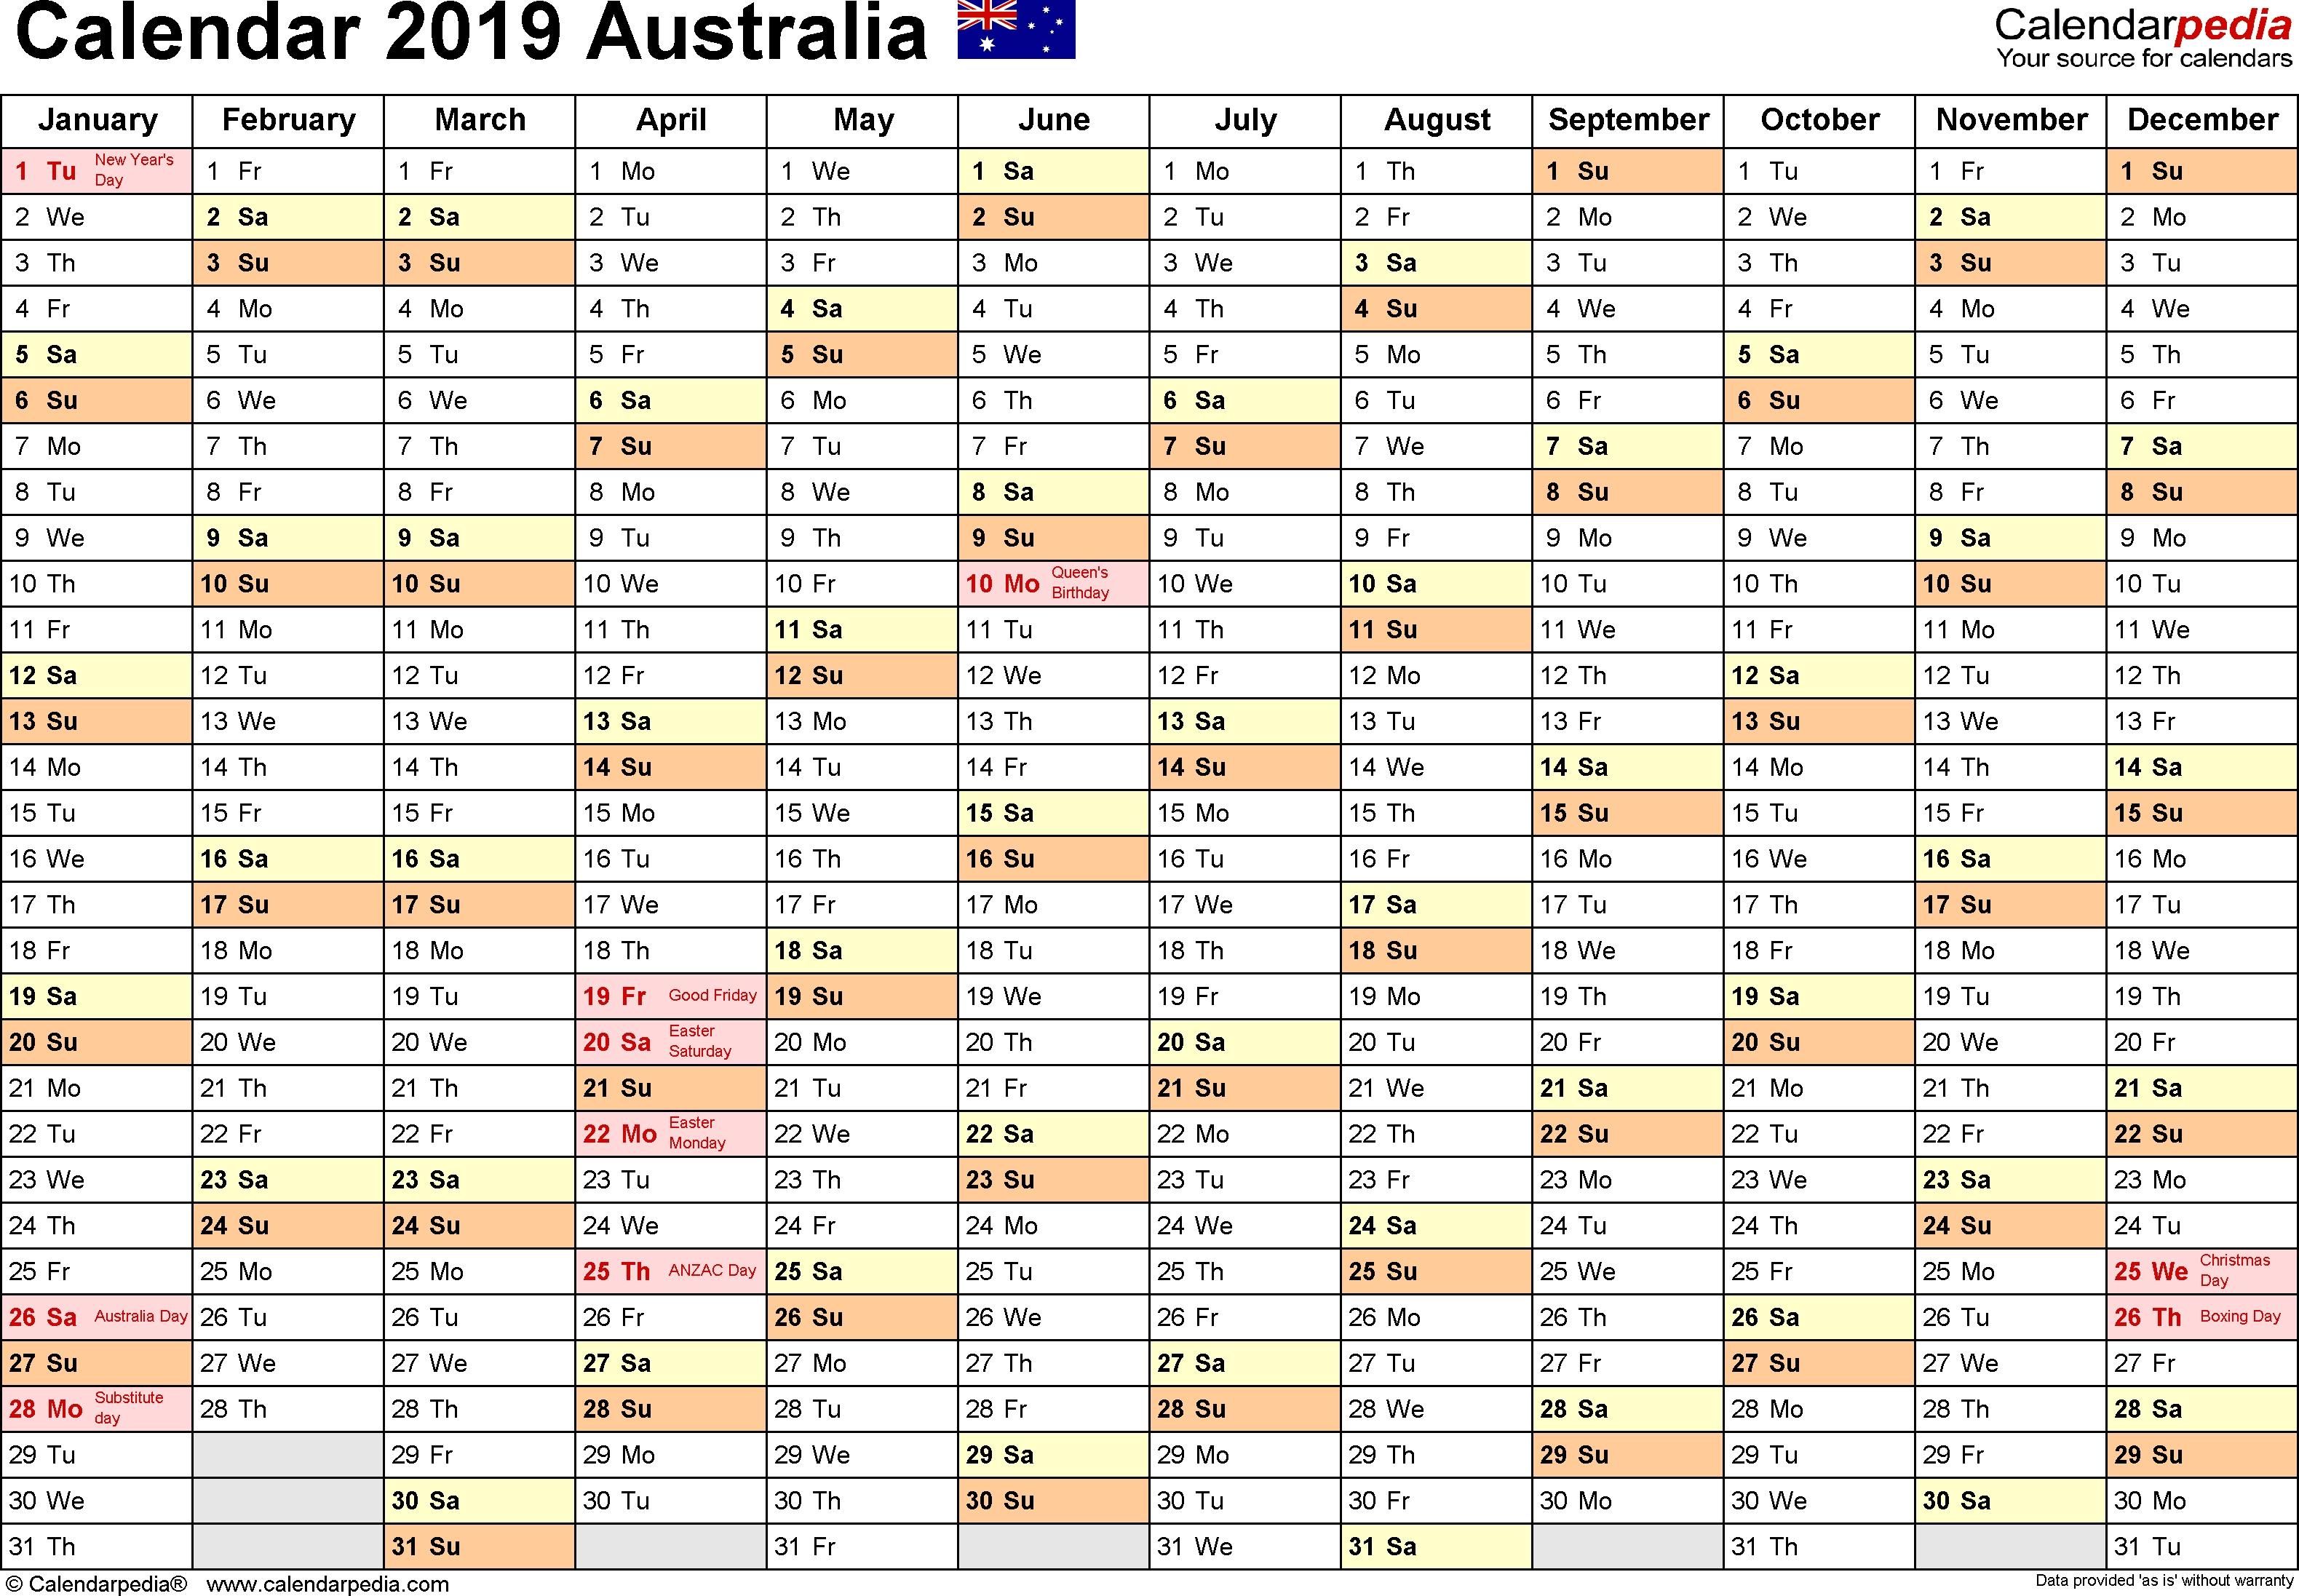 Australia Calendar 2019 - Free Printable Pdf Templates  Financial Year Australia Callendar